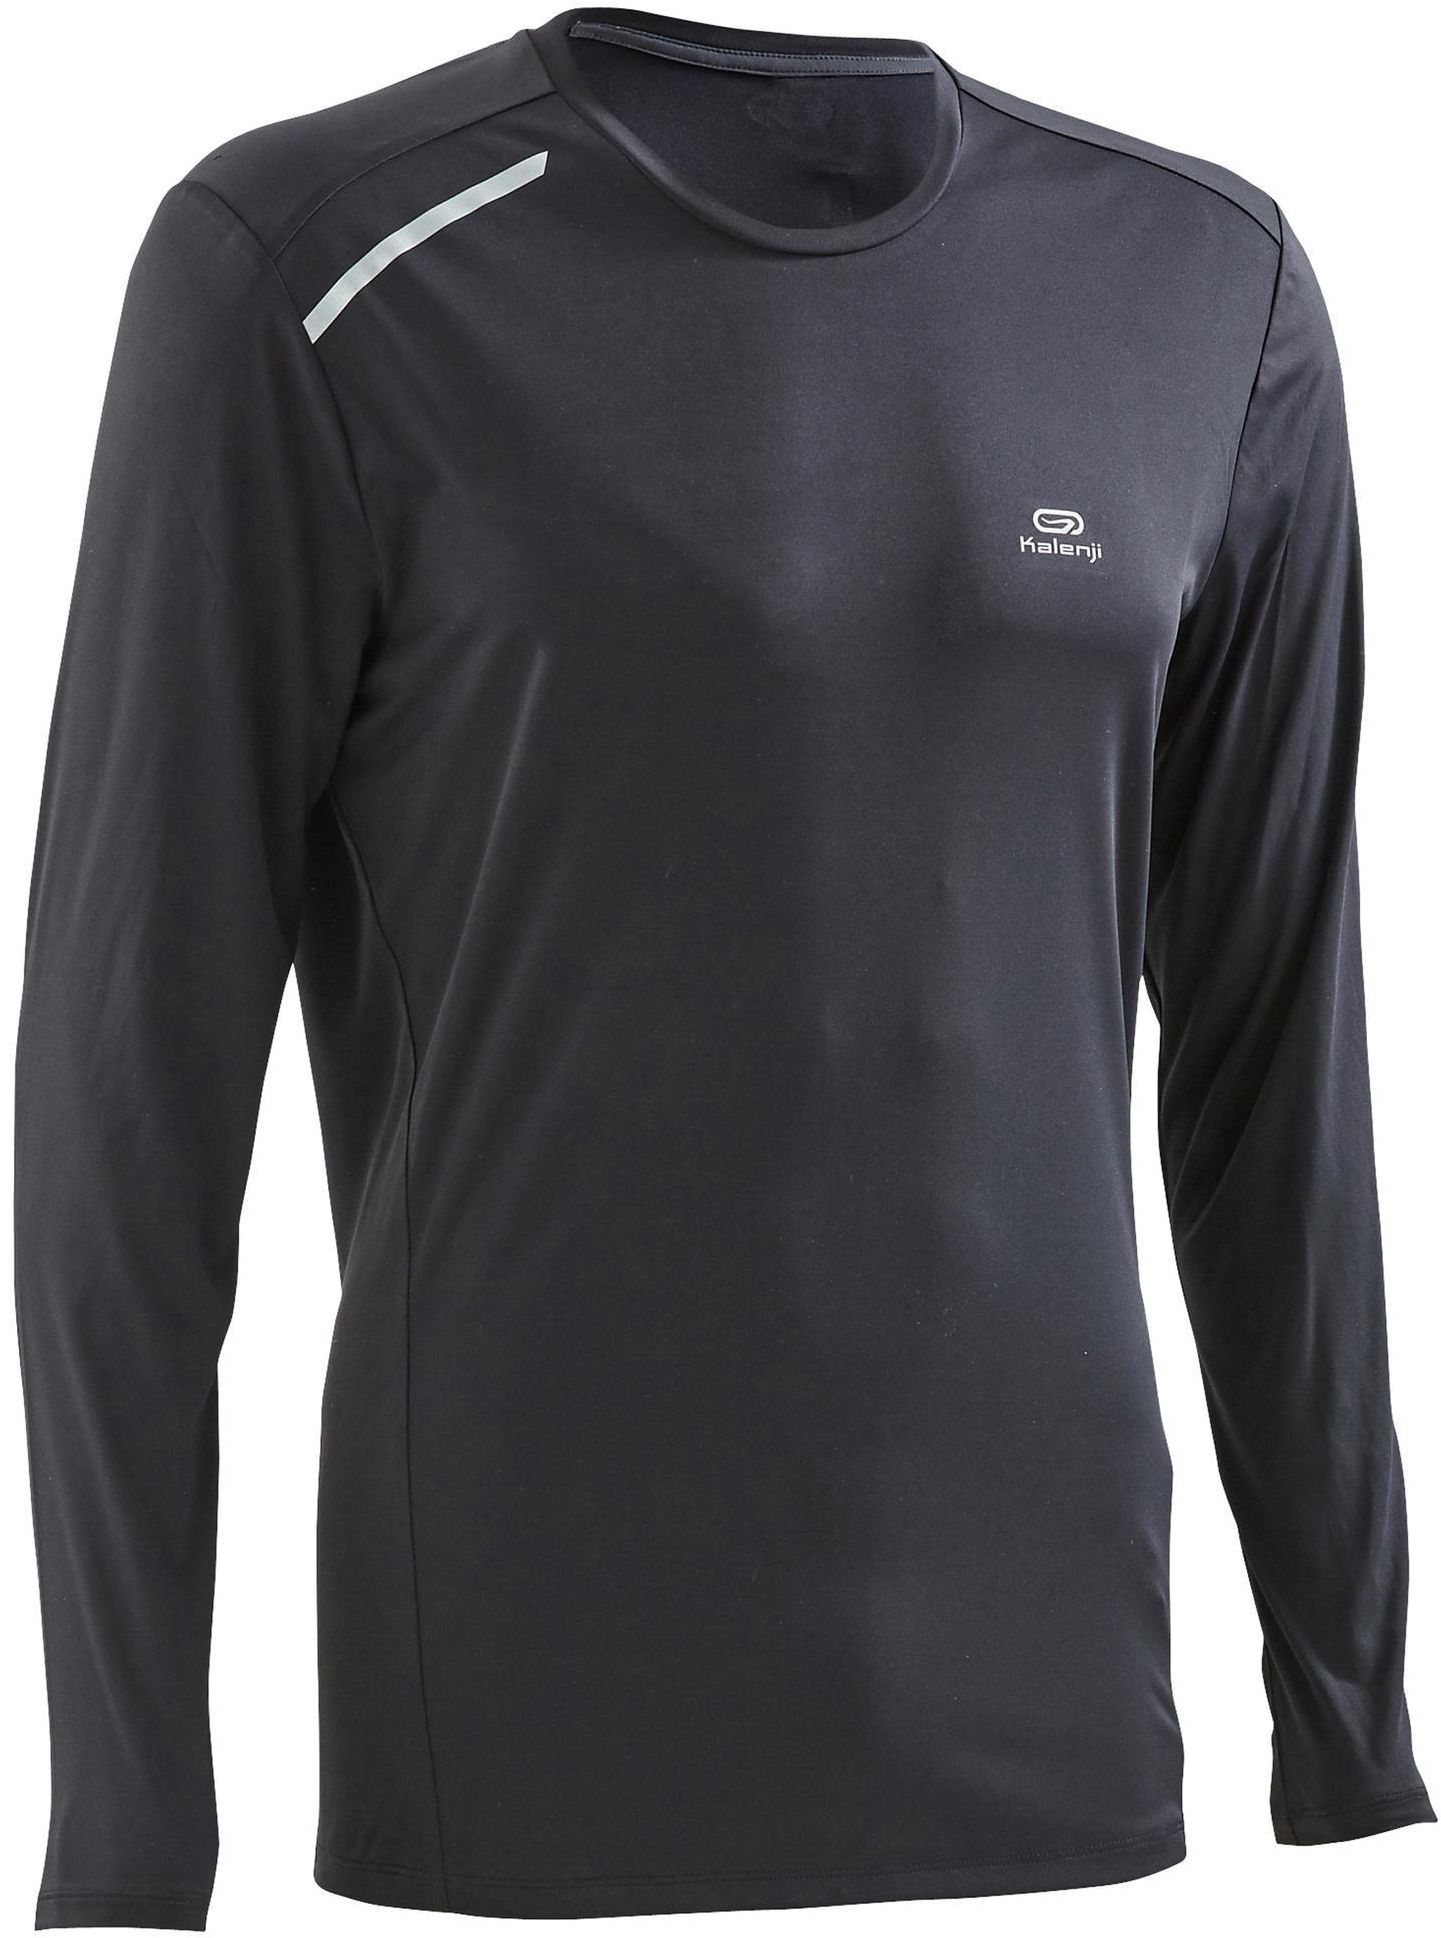 Koszulka do biegania długi rękaw SUN PROTECT męska